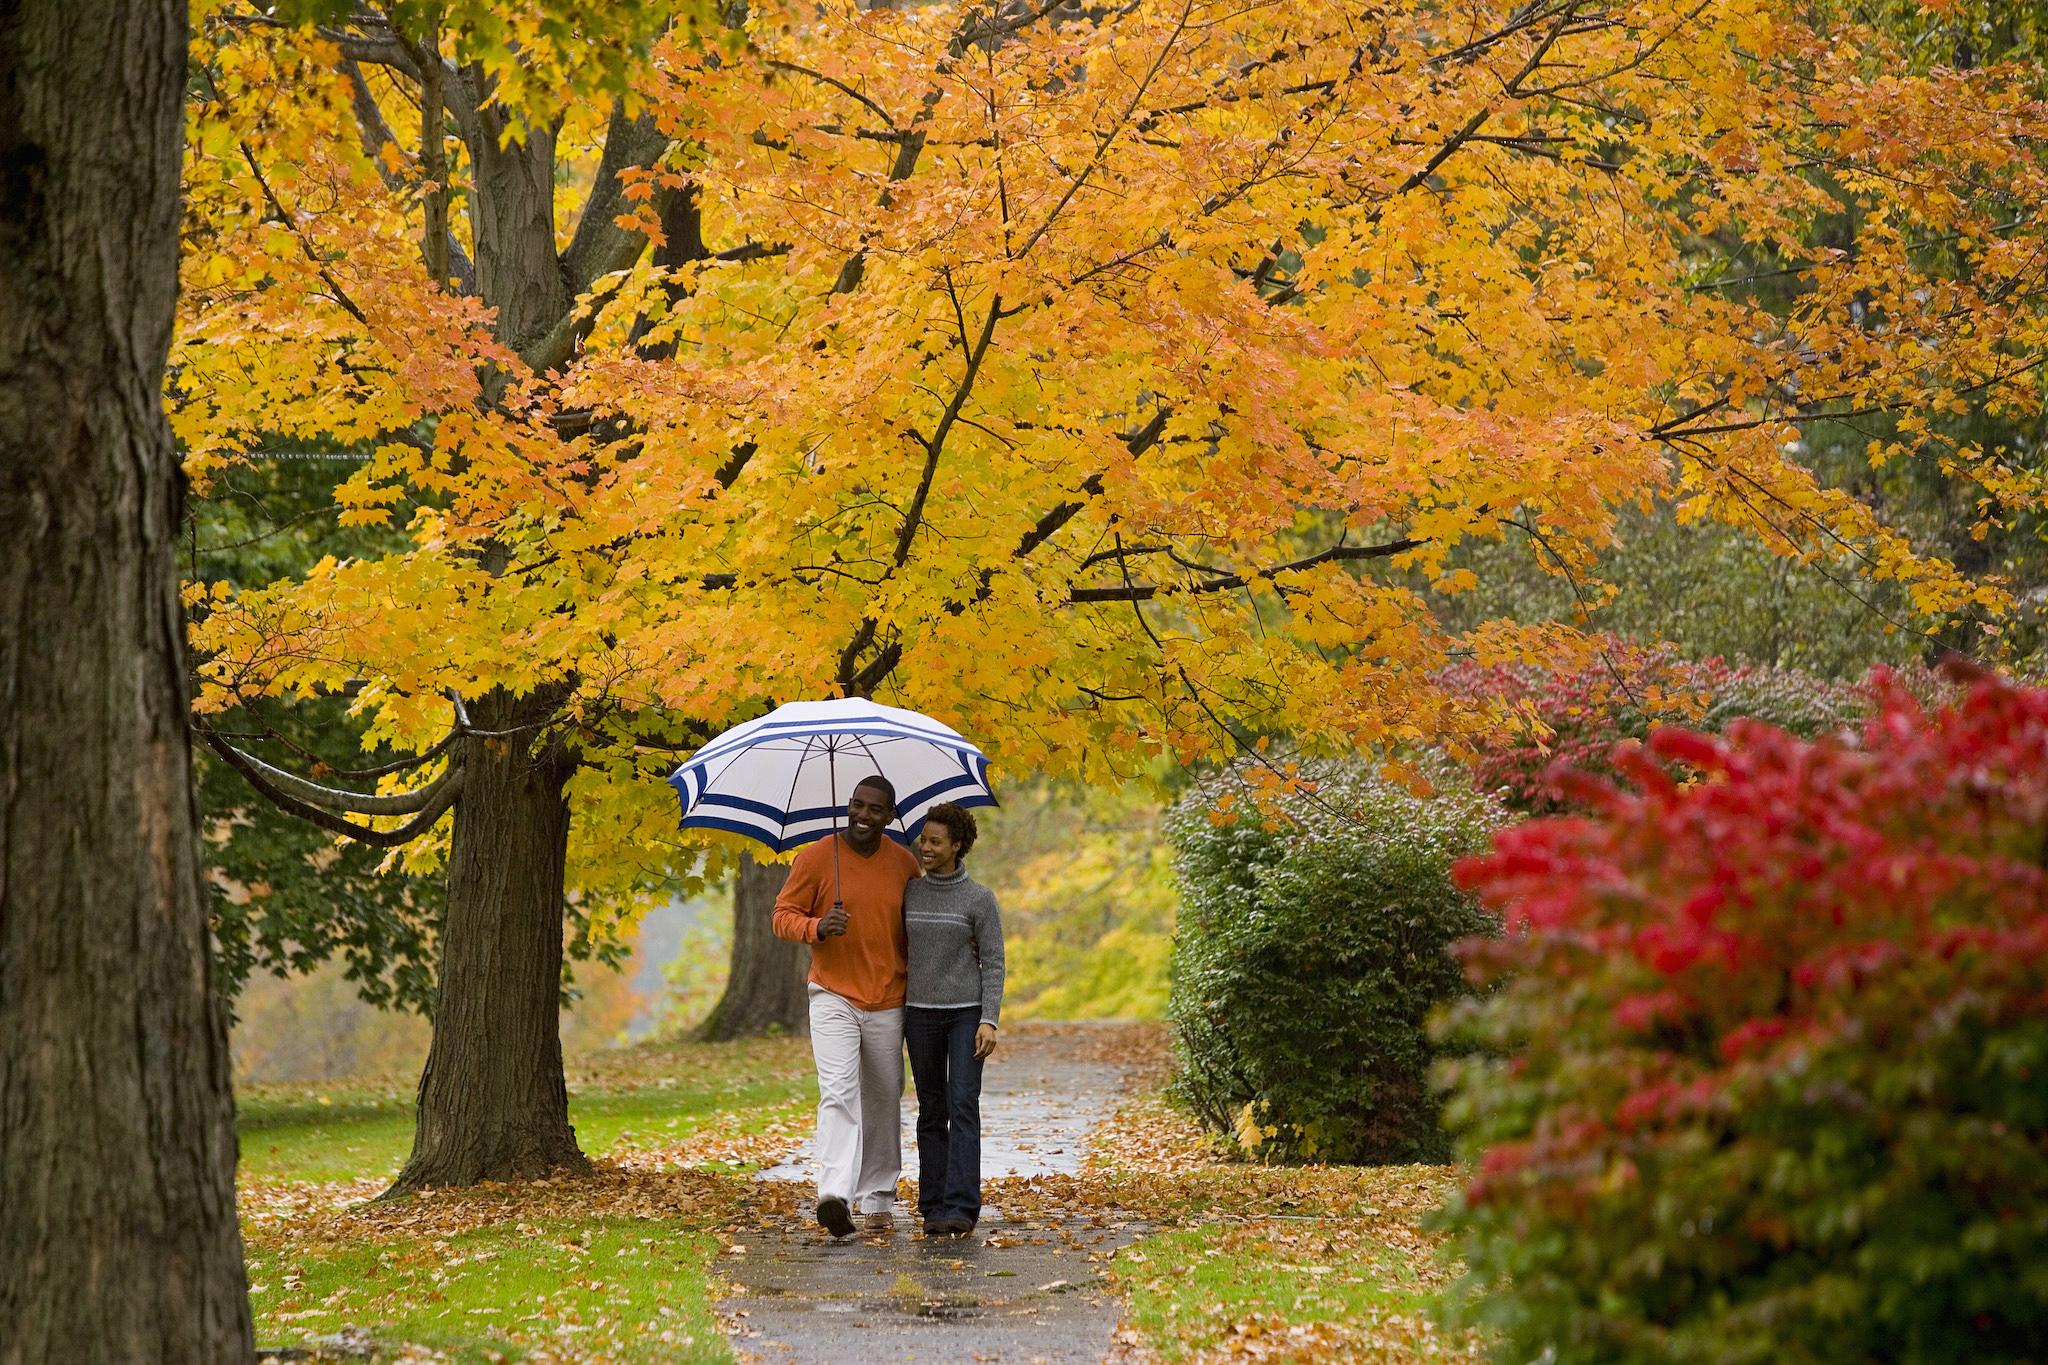 New England Fall Foliage Wallpaper Wallpapersafari